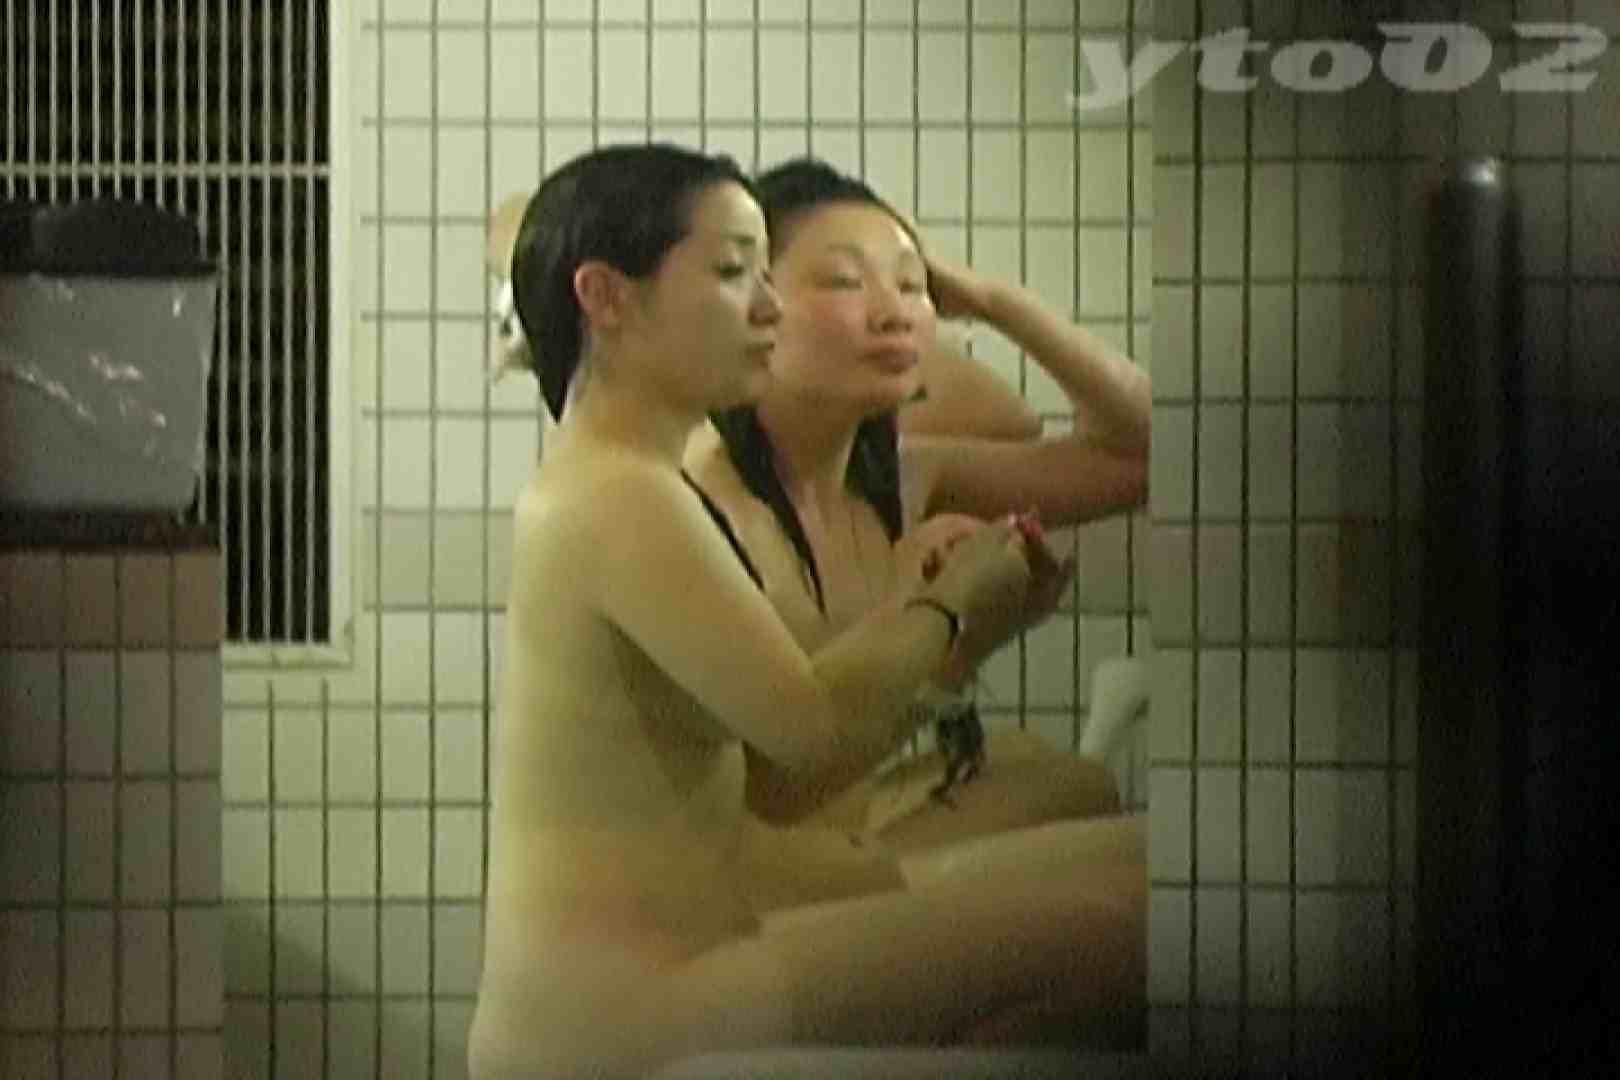 ▲復活限定▲合宿ホテル女風呂盗撮 Vol.12 女風呂 エロ無料画像 103枚 103